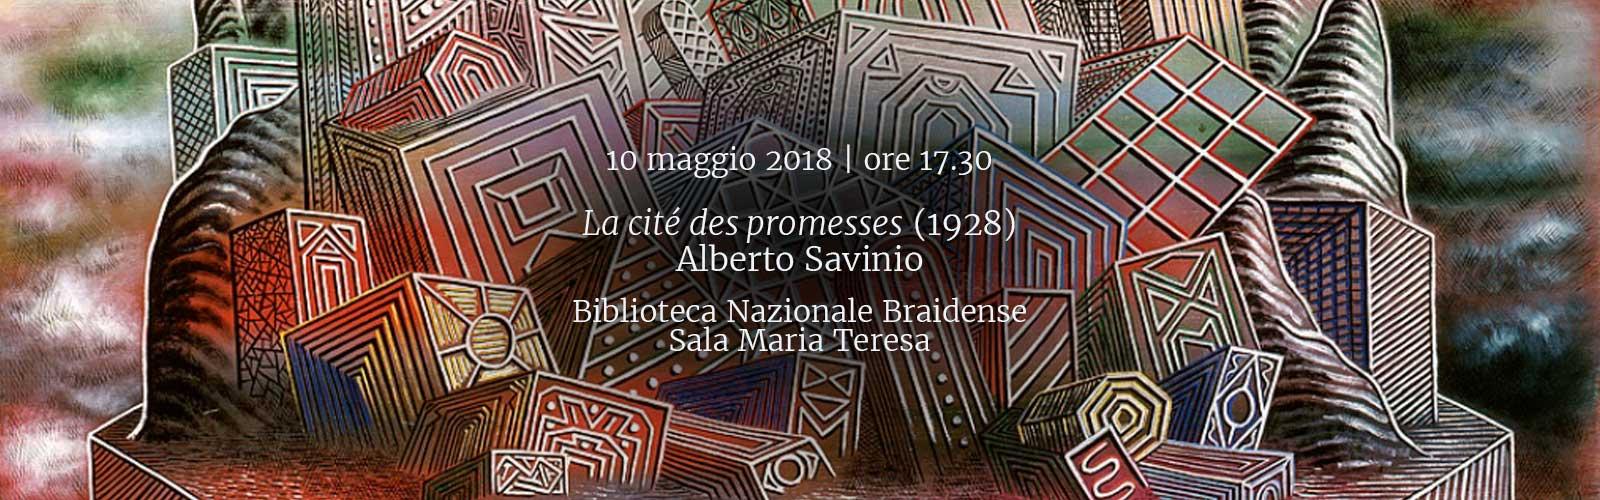 <em>La cité des promesses</em> (1928)<br>Alberto Savinio